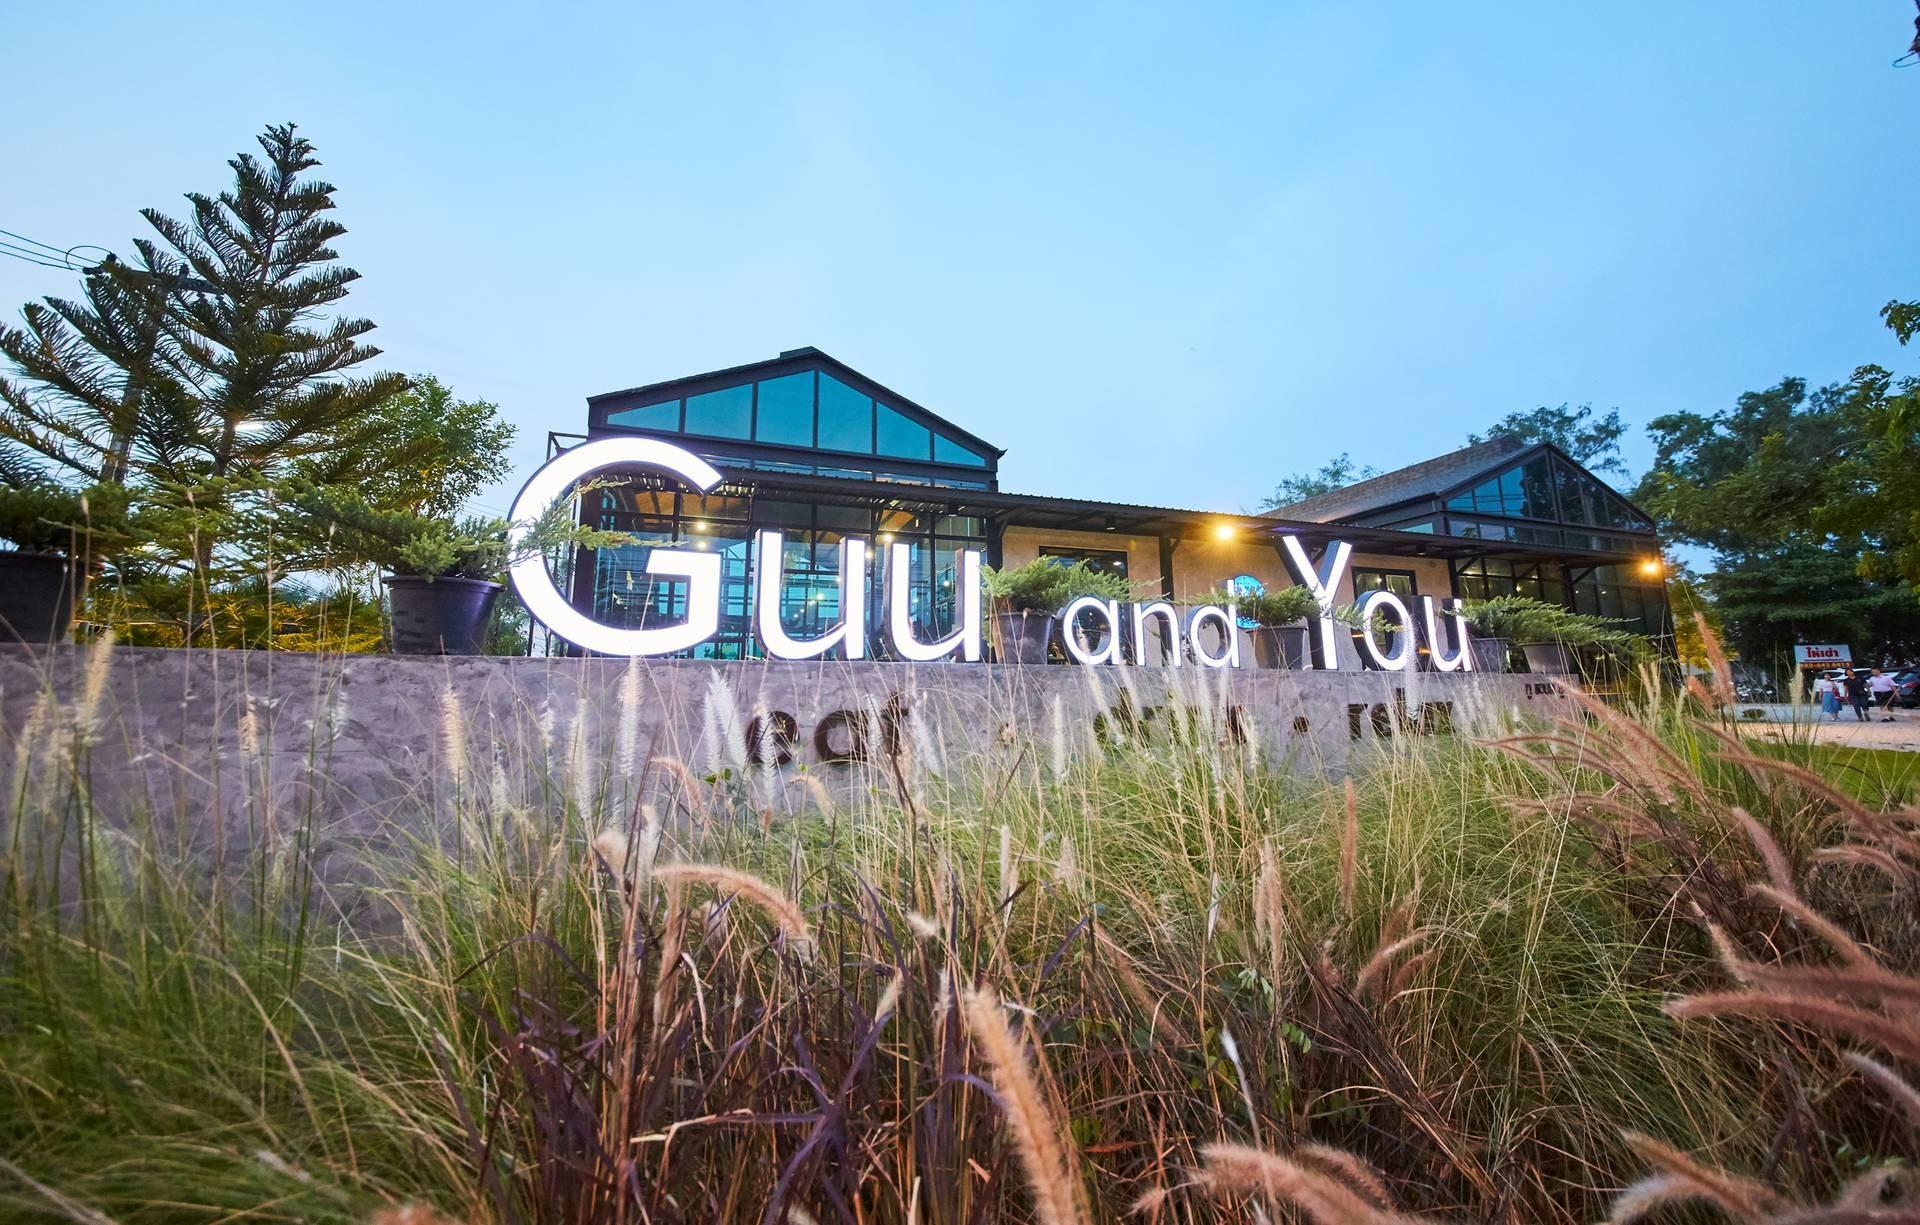 Guu&You ระยอง